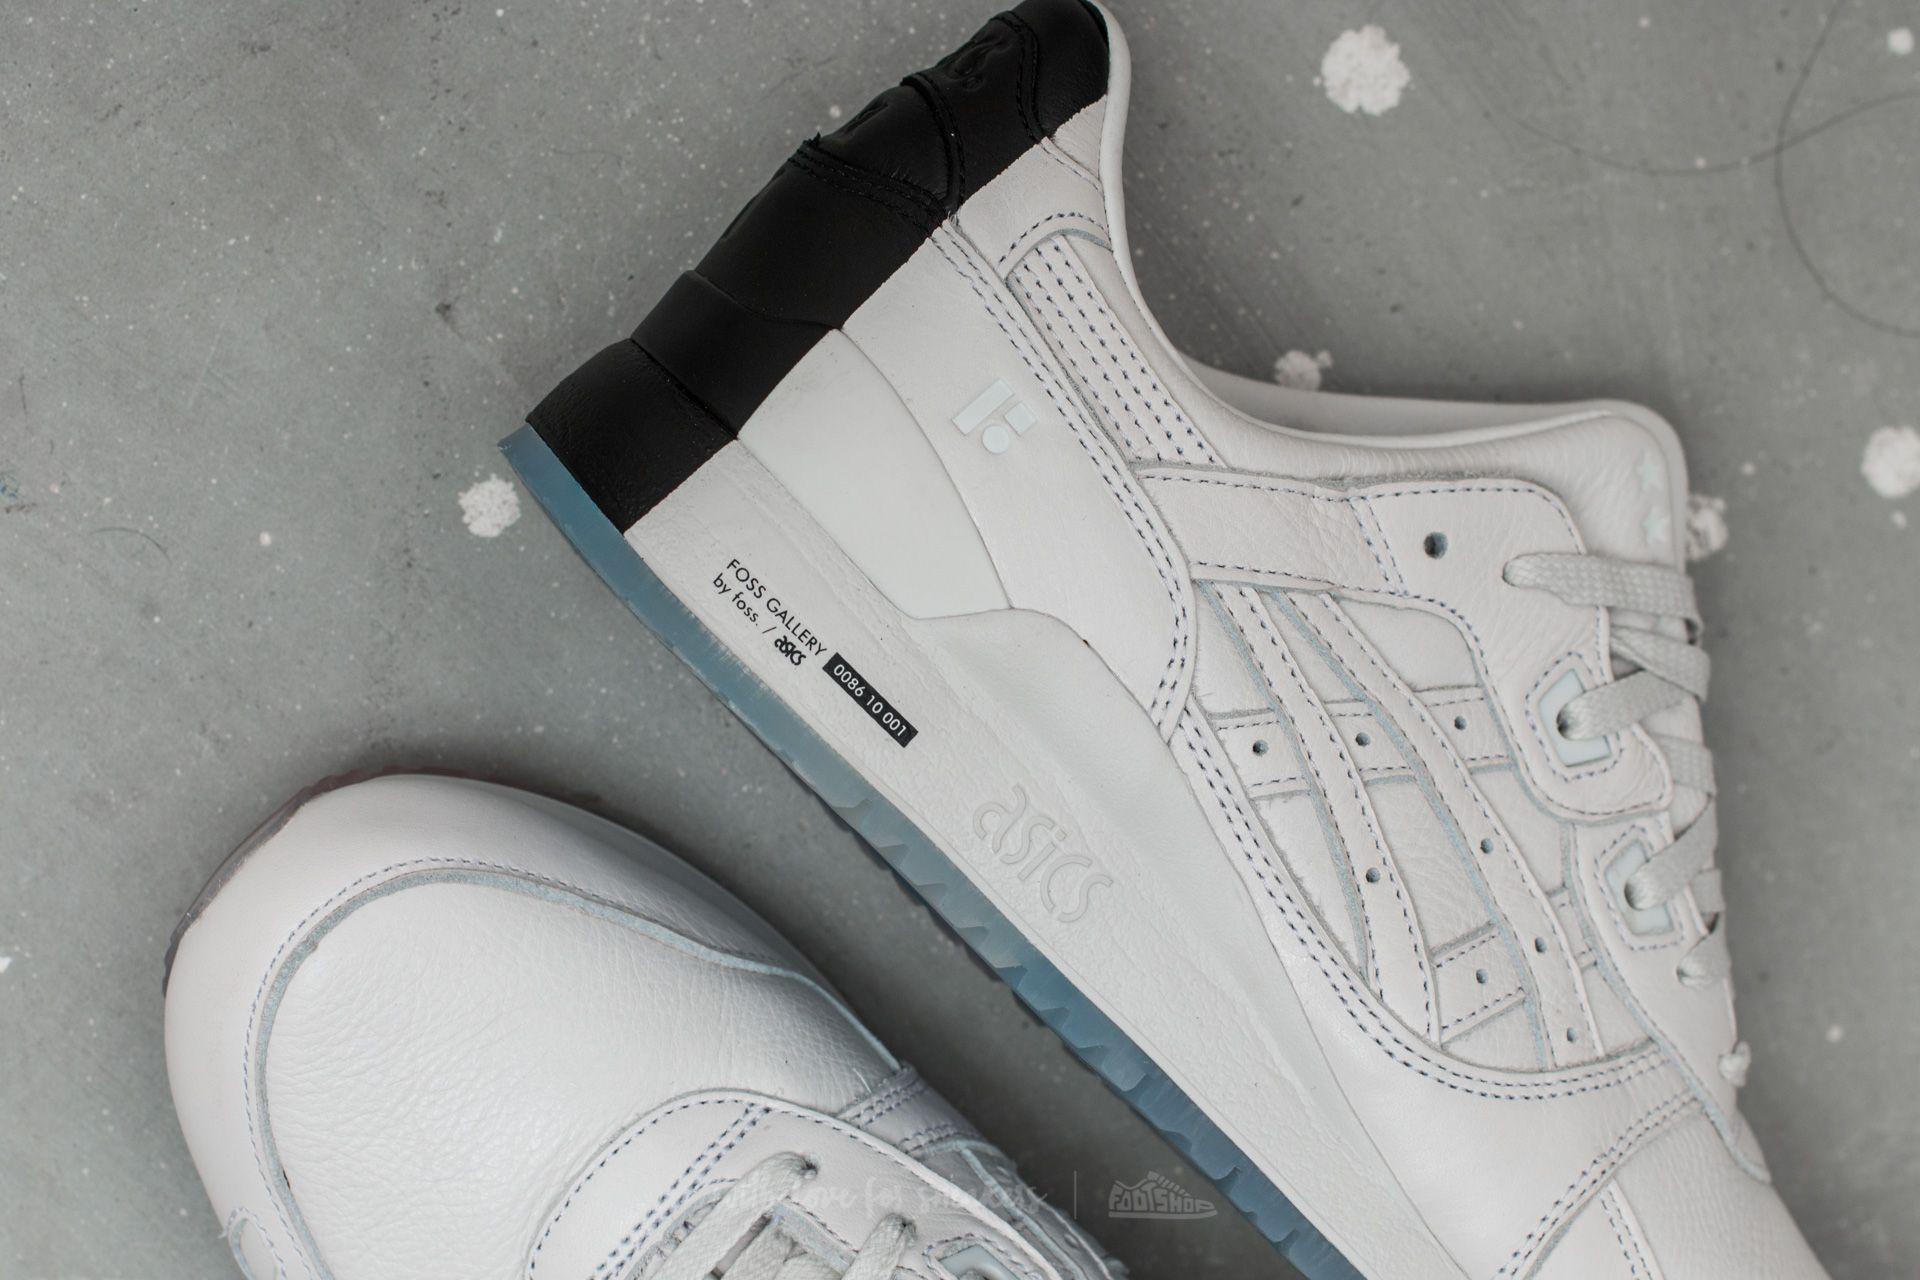 finest selection 13df9 c7400 Asics Gel-Lyte III x FOSS White/ White | Footshop